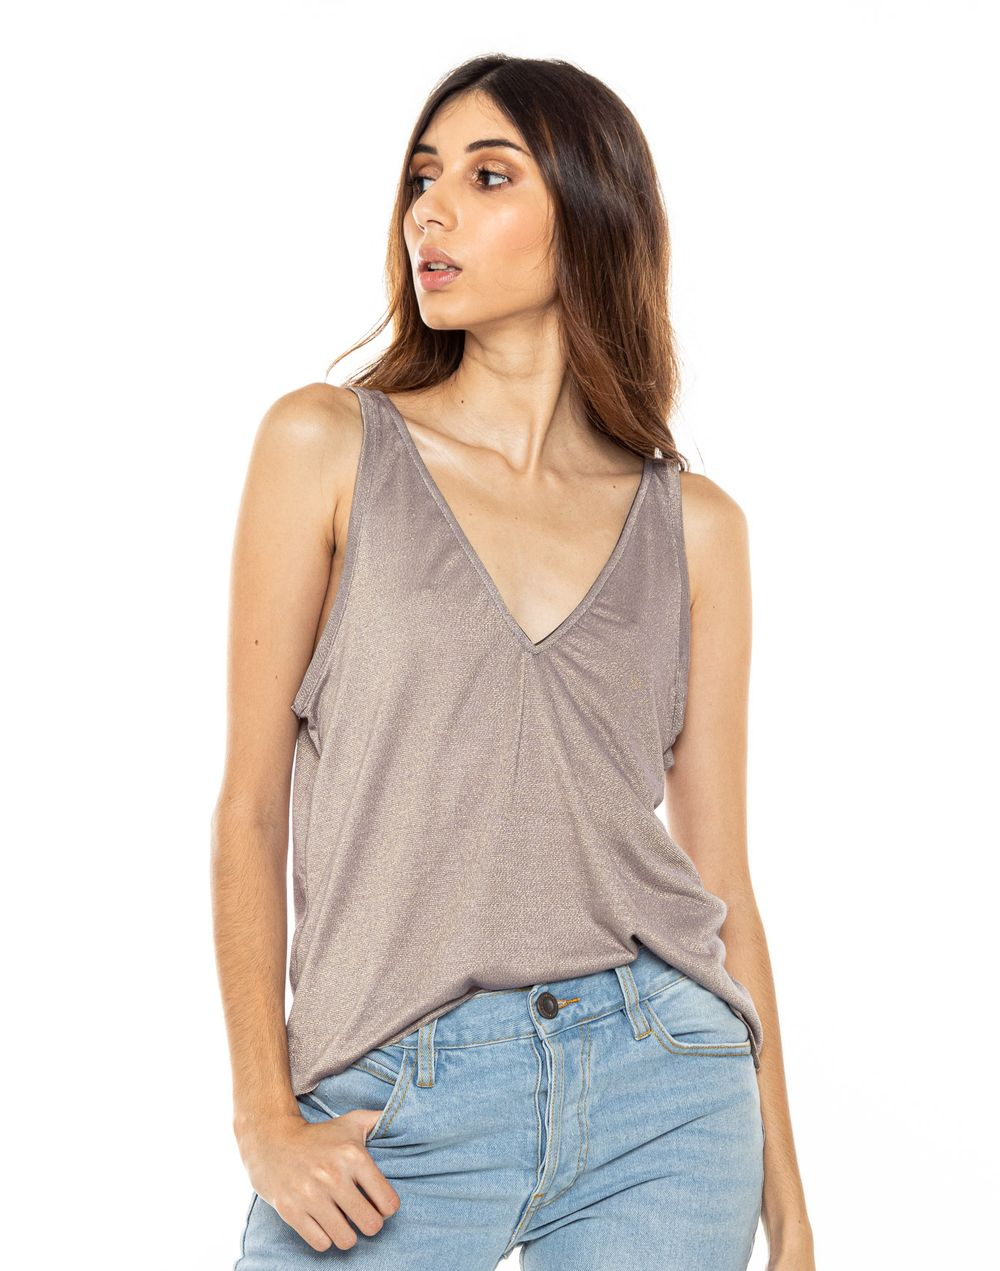 camiseta-180293-gris-1.jpg